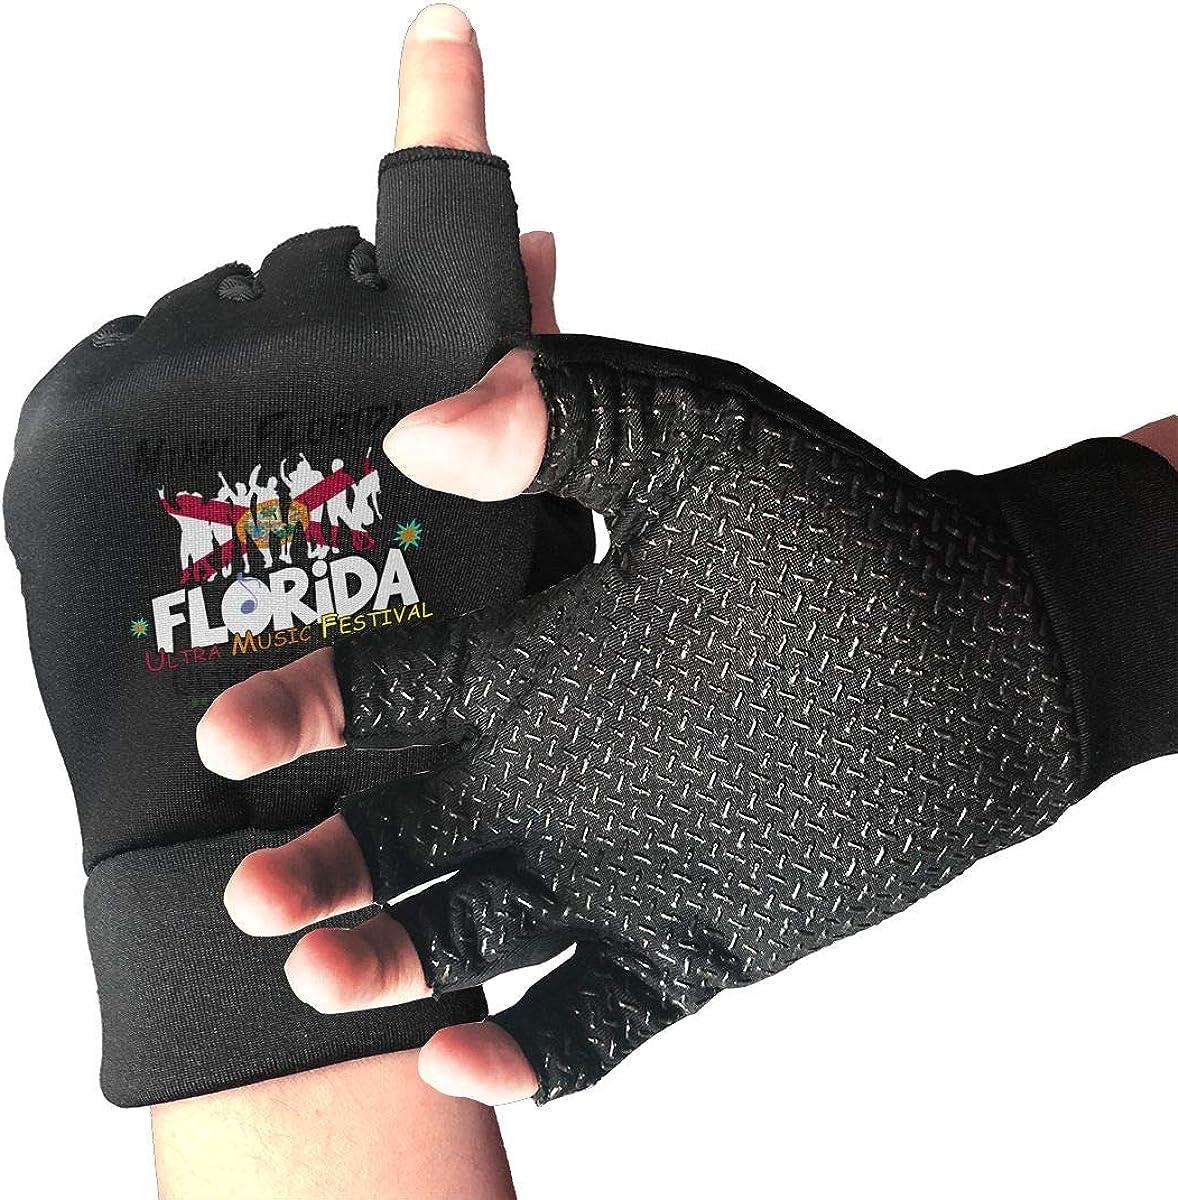 Gloves Florida Music Festival Fingerless Gloves Short Touchscreen Gloves Winter Motorcycle Biker Mitten